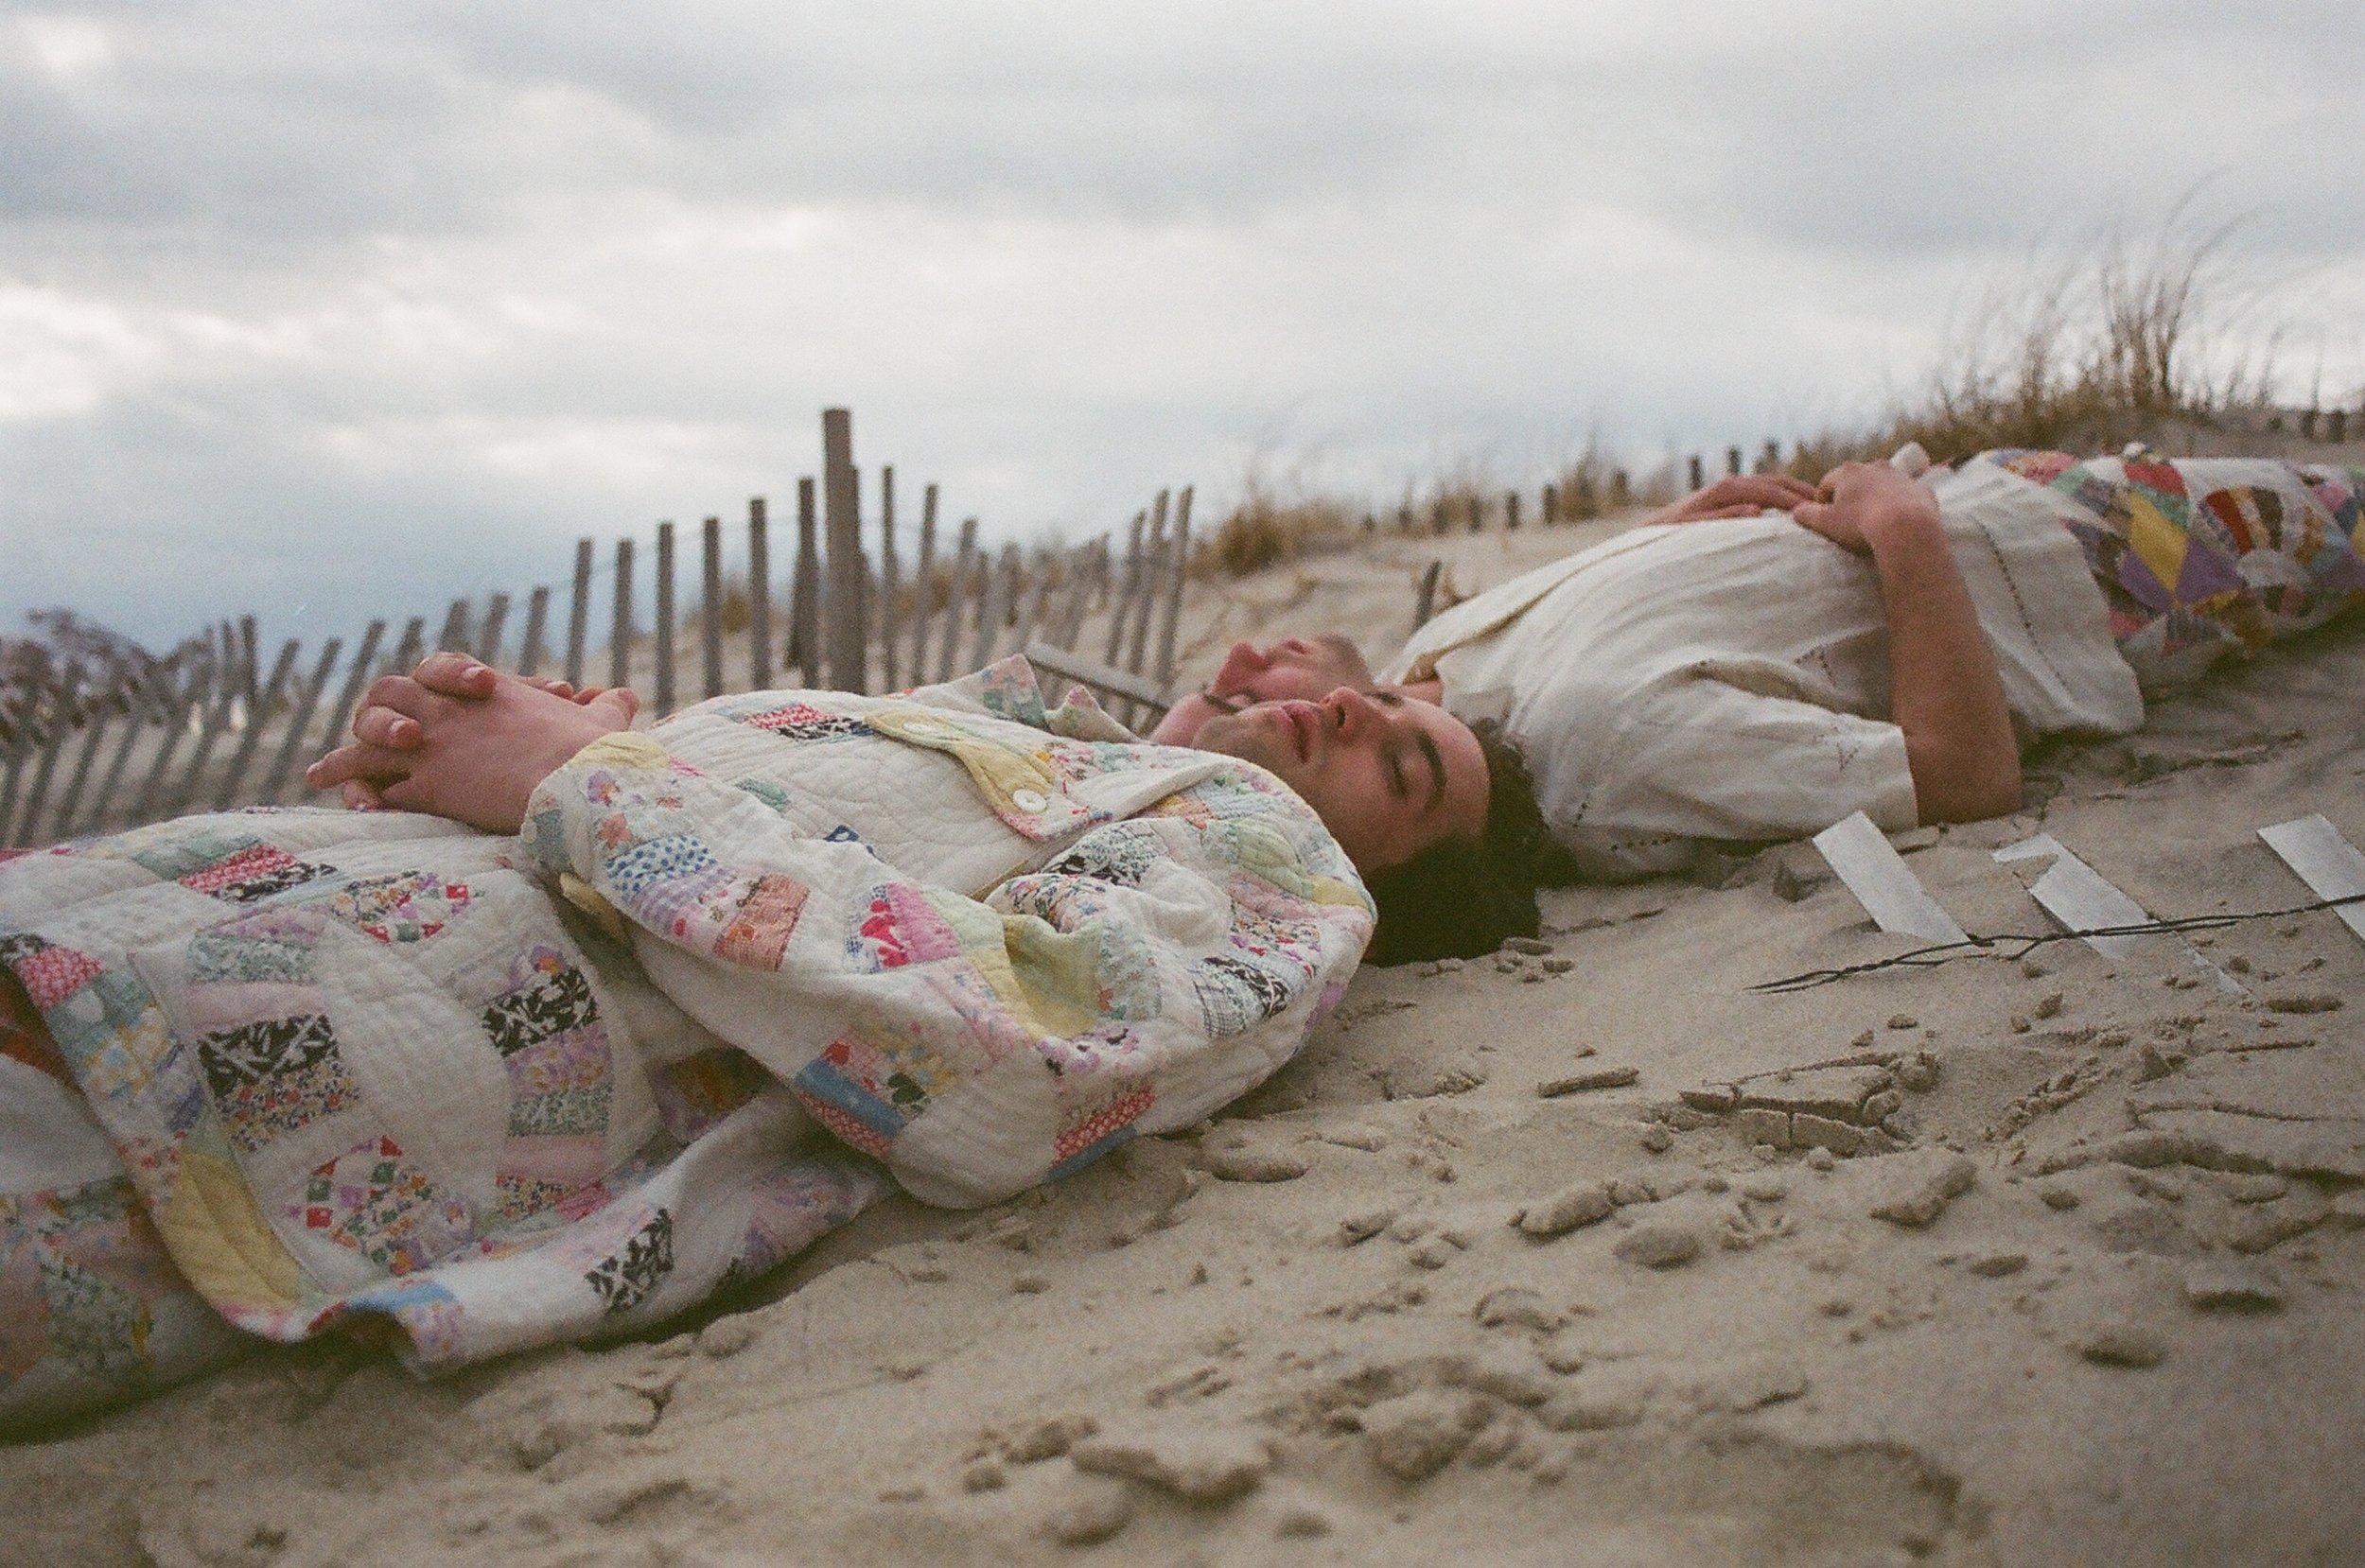 Chelsy-Mitchel-photographer-bode-nyc-fashion-beach-editorial-beachside-car-christian-matthew-rice-patch.JPG